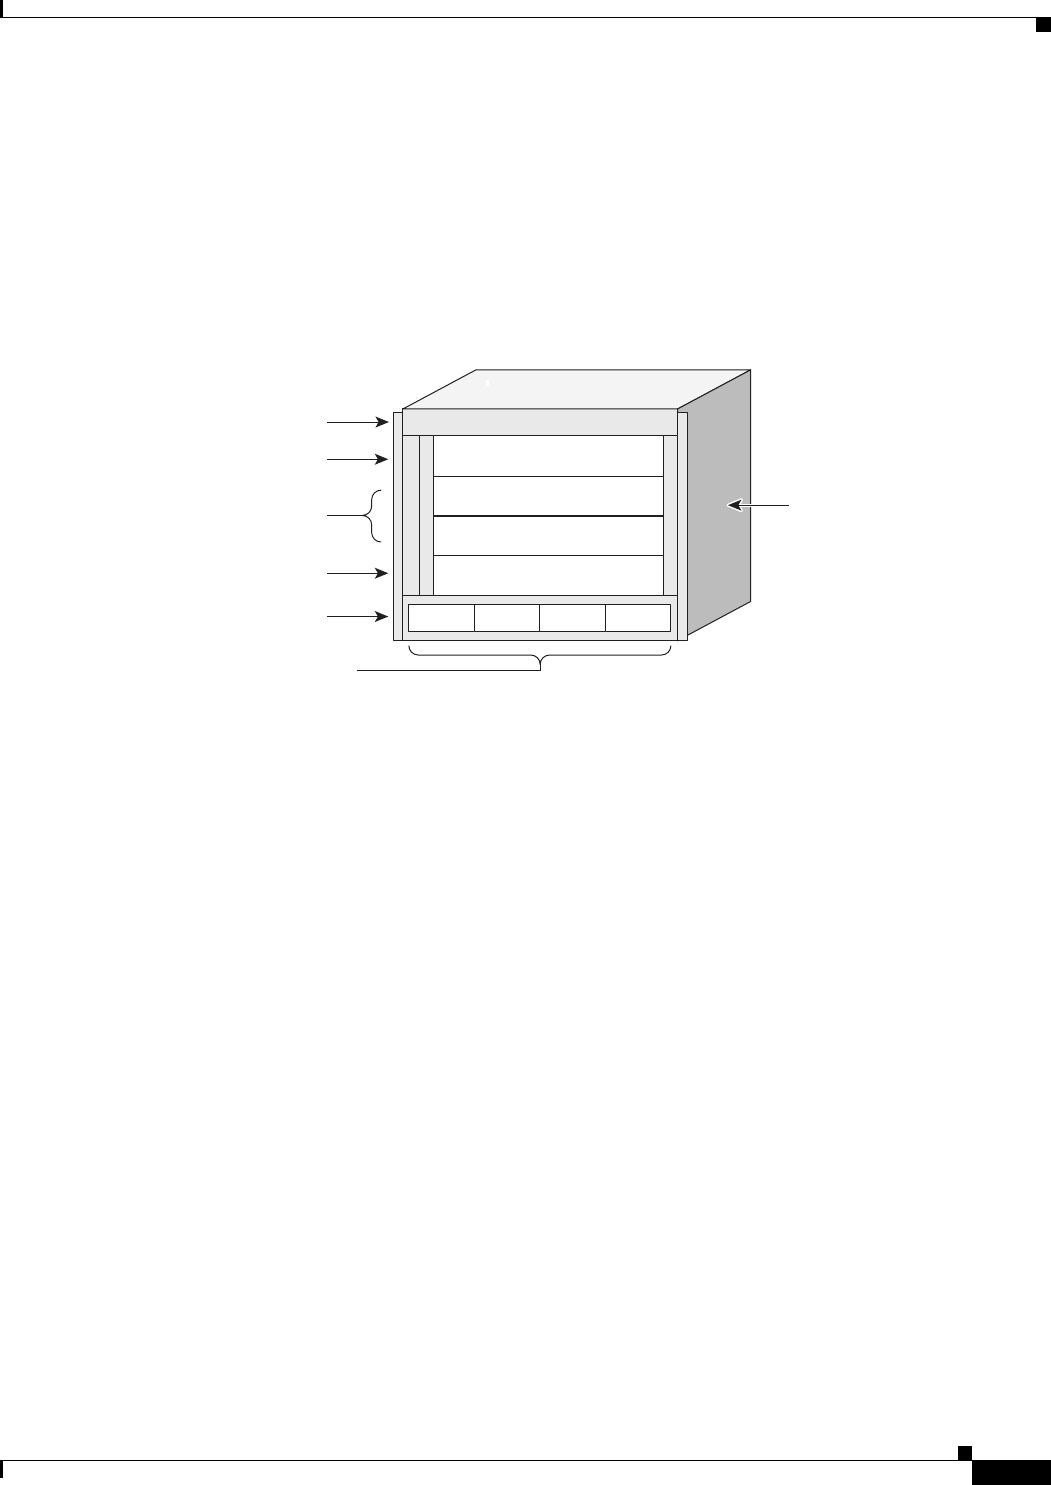 Asr 9010 Line Cards - Newletterjdi co